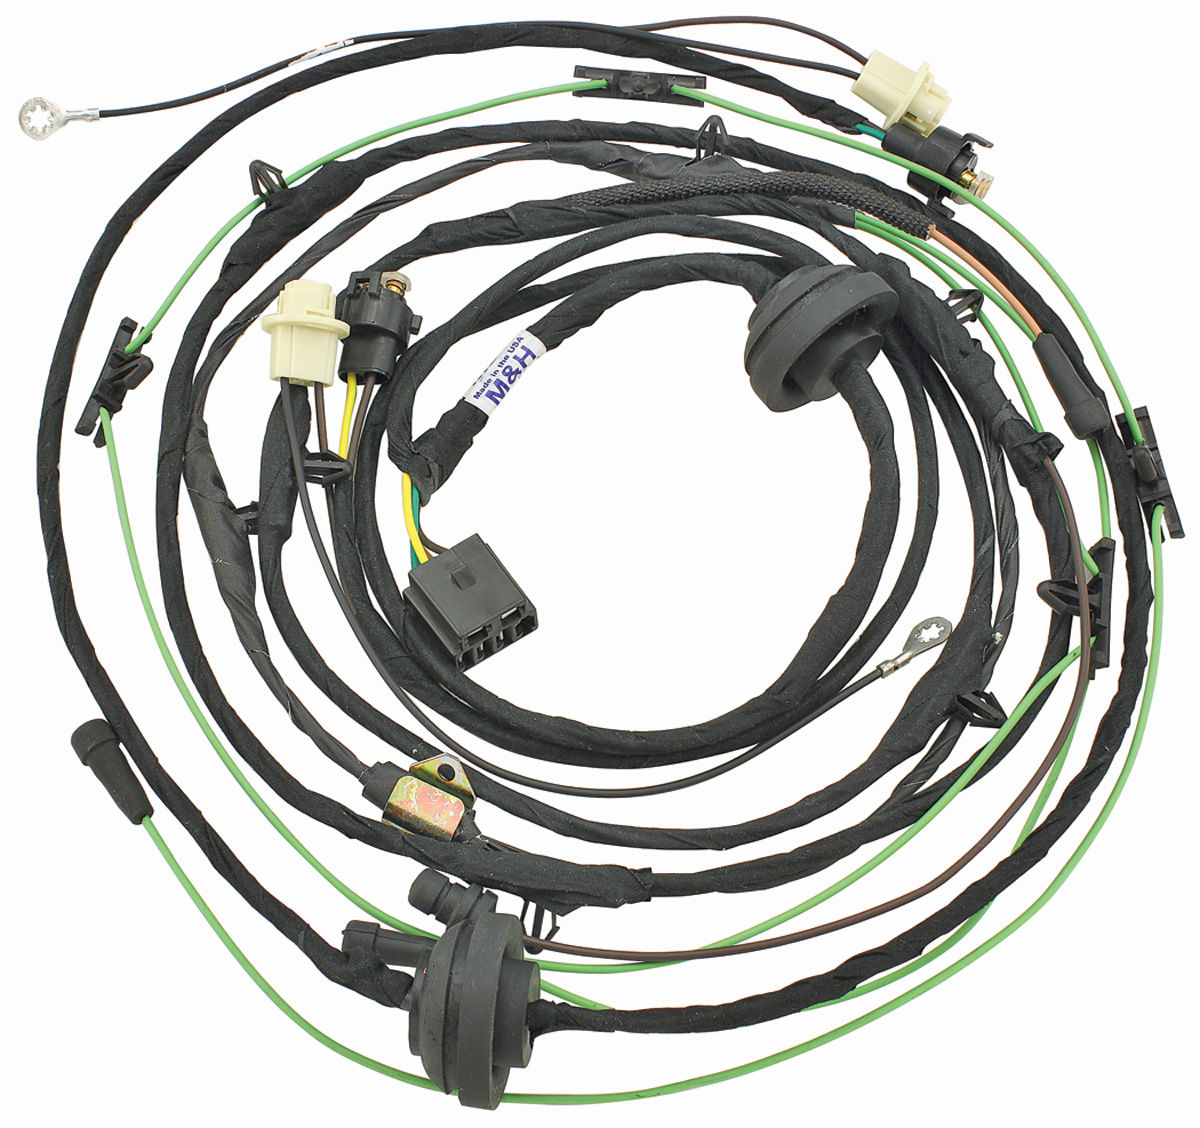 hight resolution of 72 el camino wiring harness wiring diagram wiring harness 1964 el camino